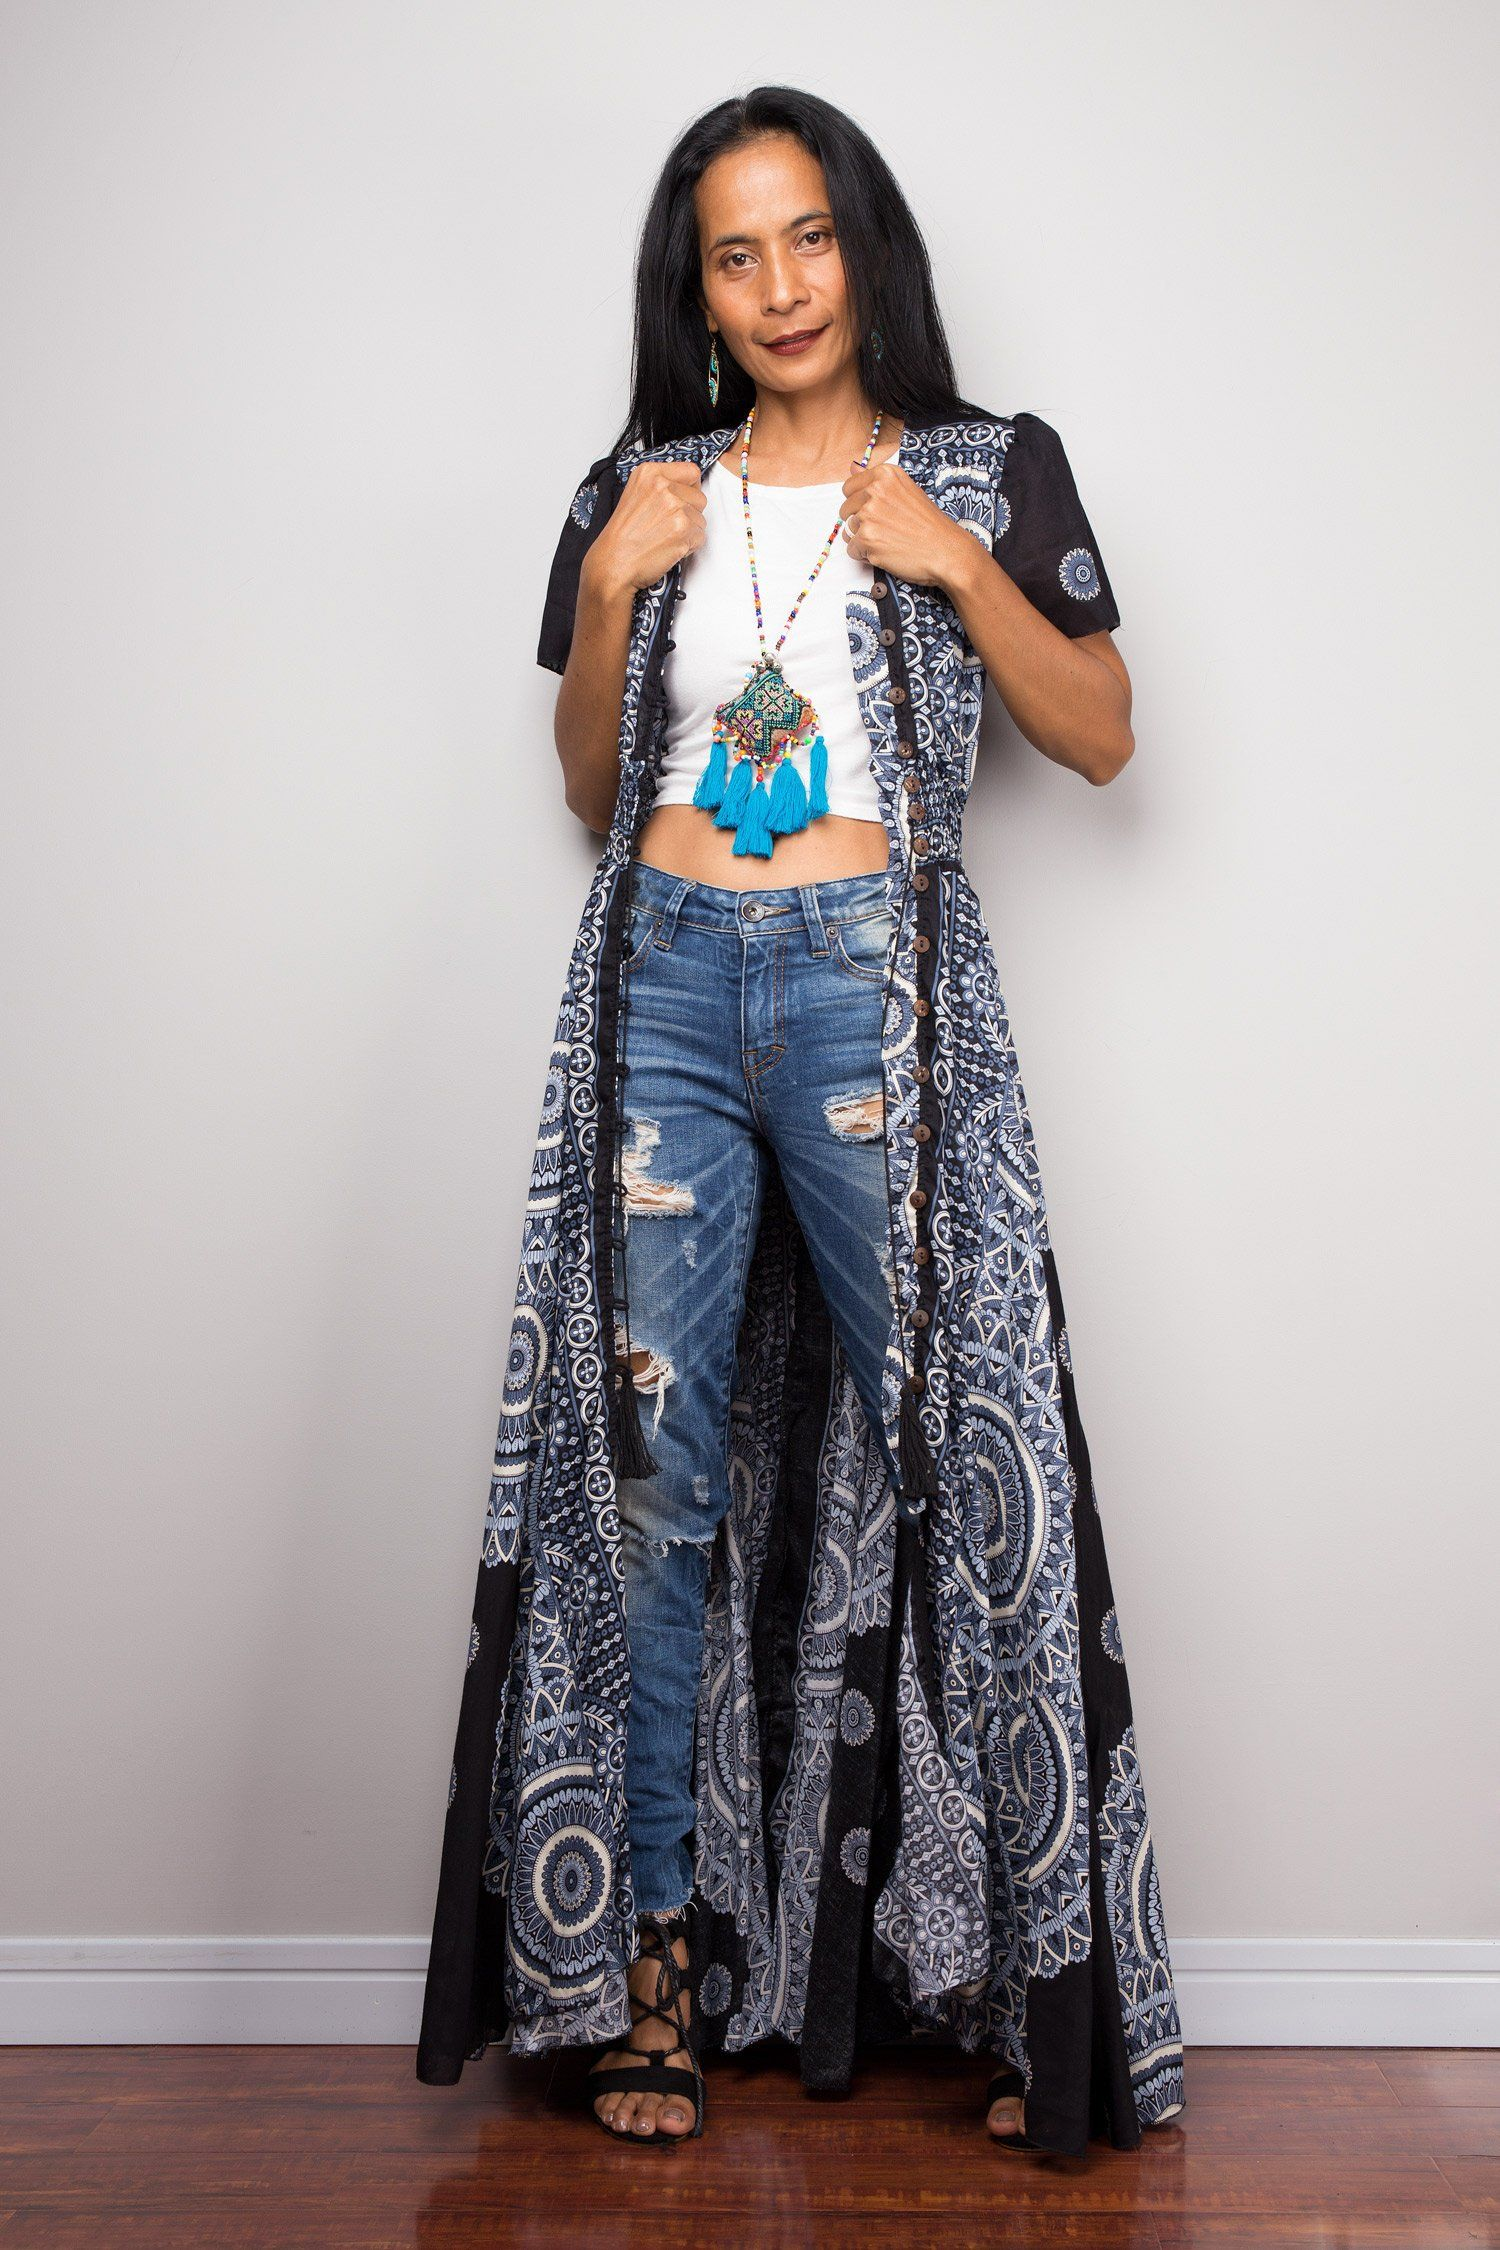 Boho Duster Dress | Bohemian Garden Party Dress | Smocked Waist Shirt Dress with short sleeves | Gypsy duster 1